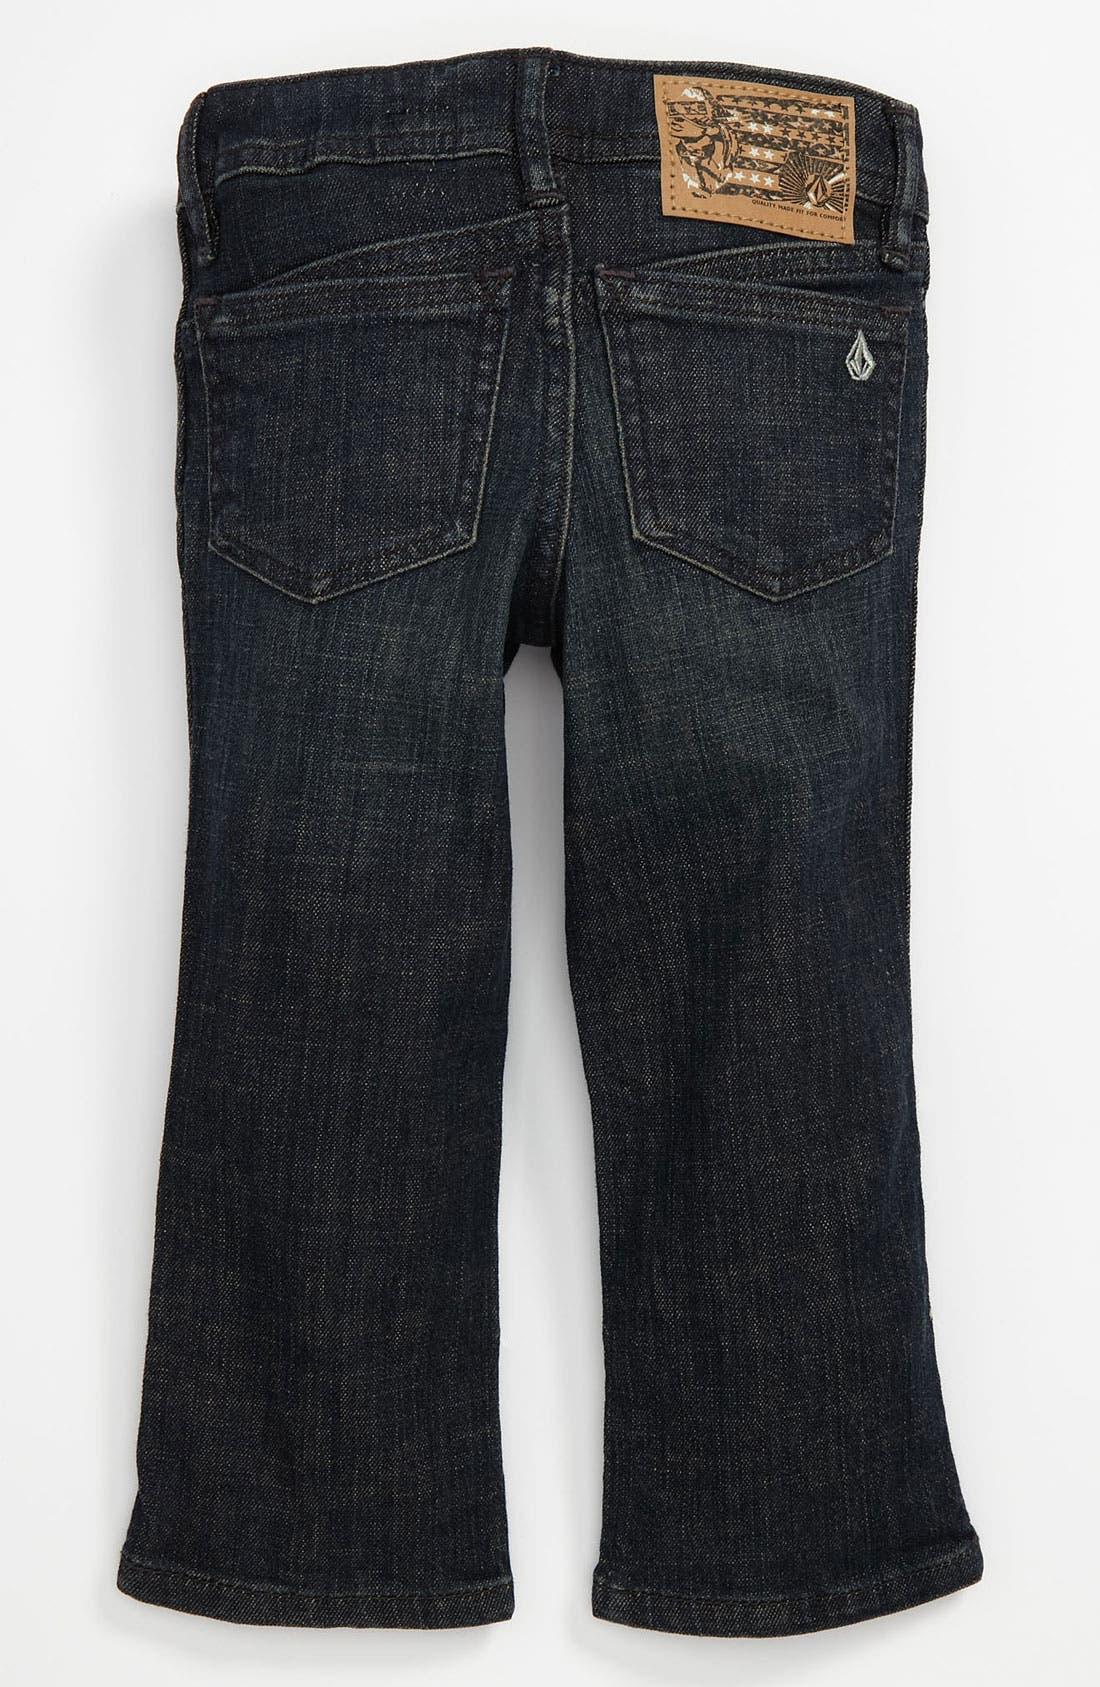 Alternate Image 1 Selected - Volcom '2x4' Jeans (Toddler)